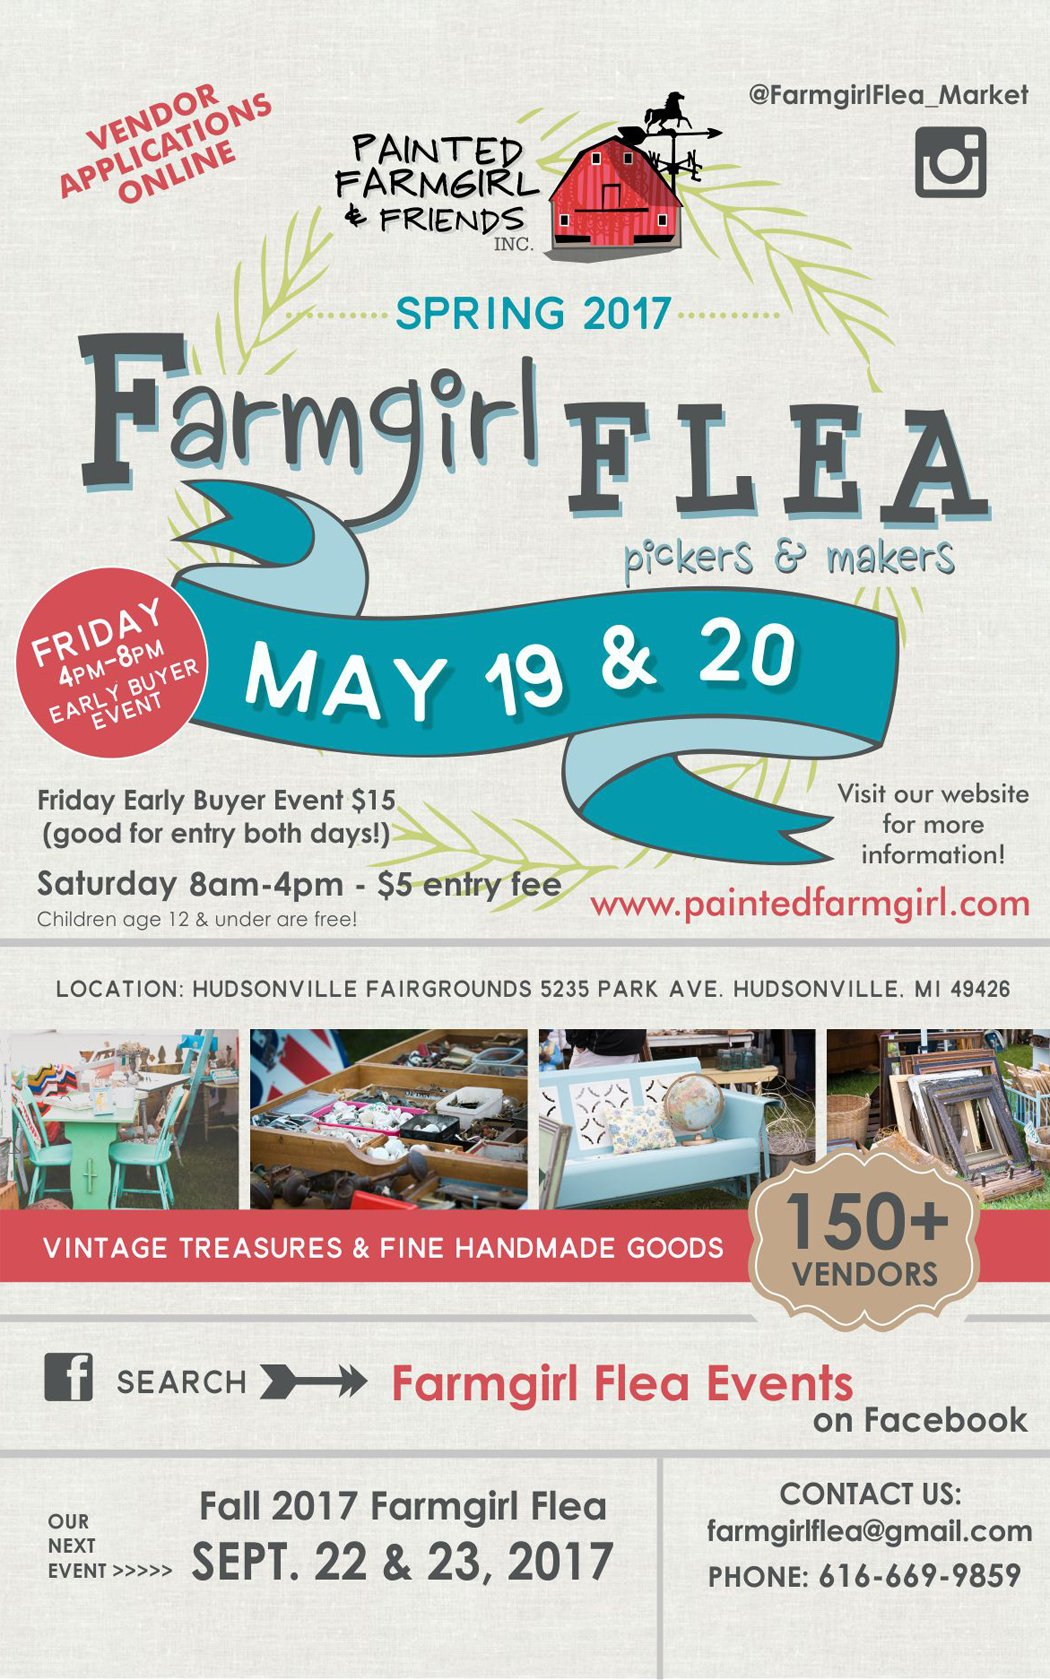 May 19, 20 – Spring 2017 Farmgirl Flea